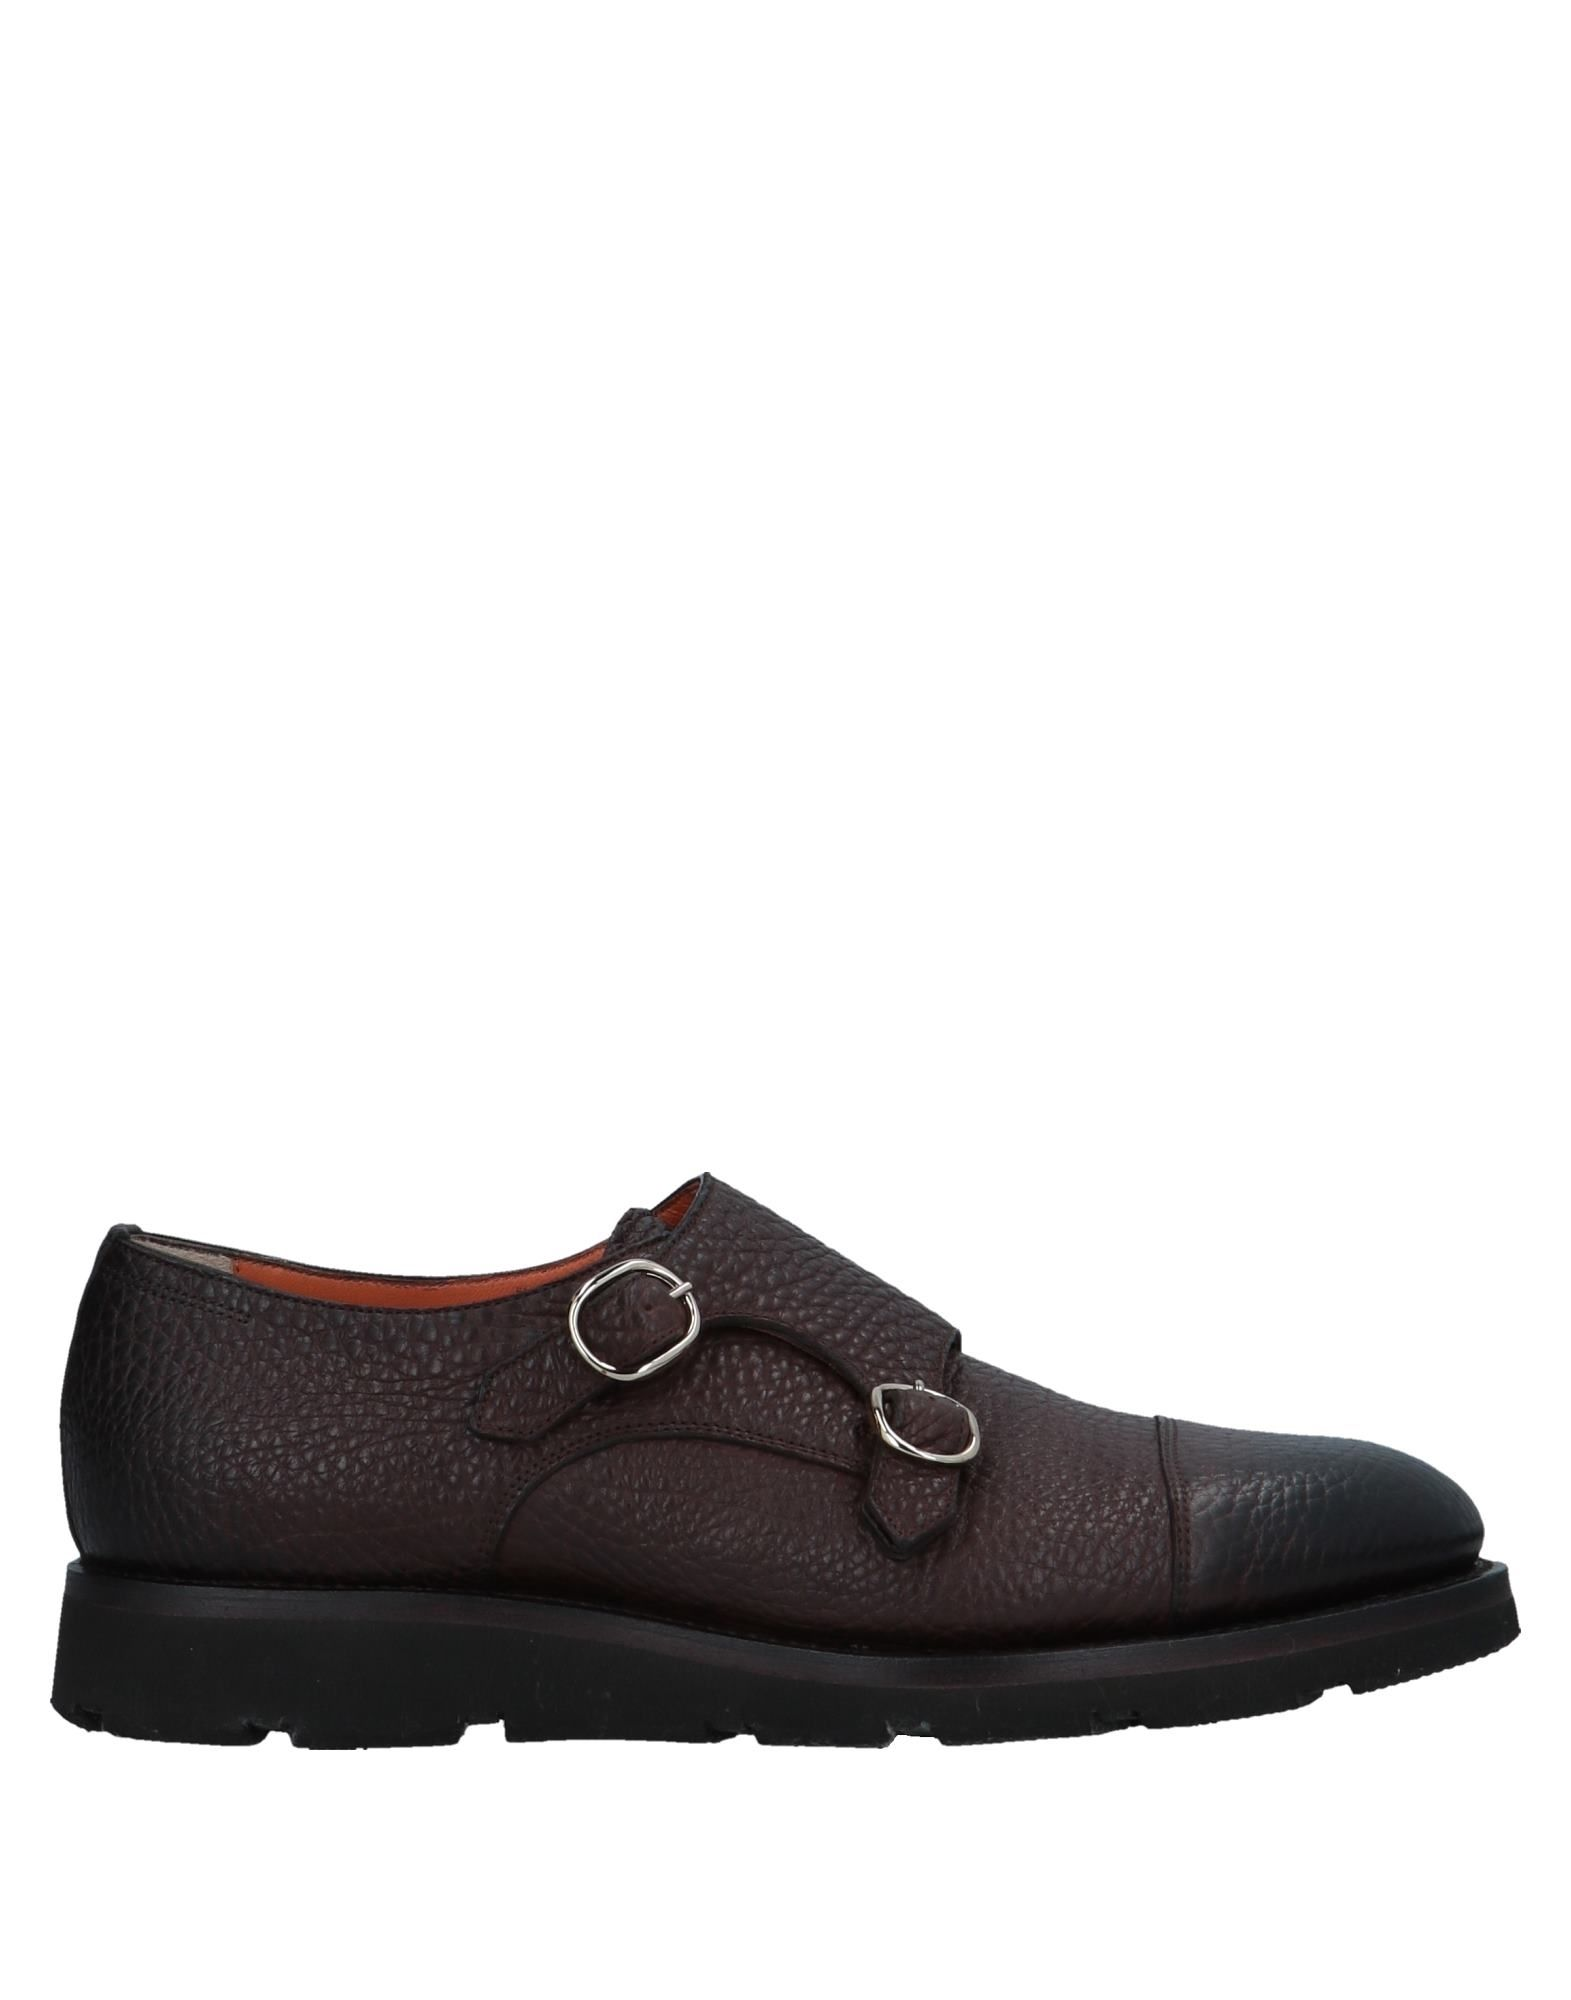 Santoni Mokassins Herren  11541383LA Gute Qualität beliebte Schuhe